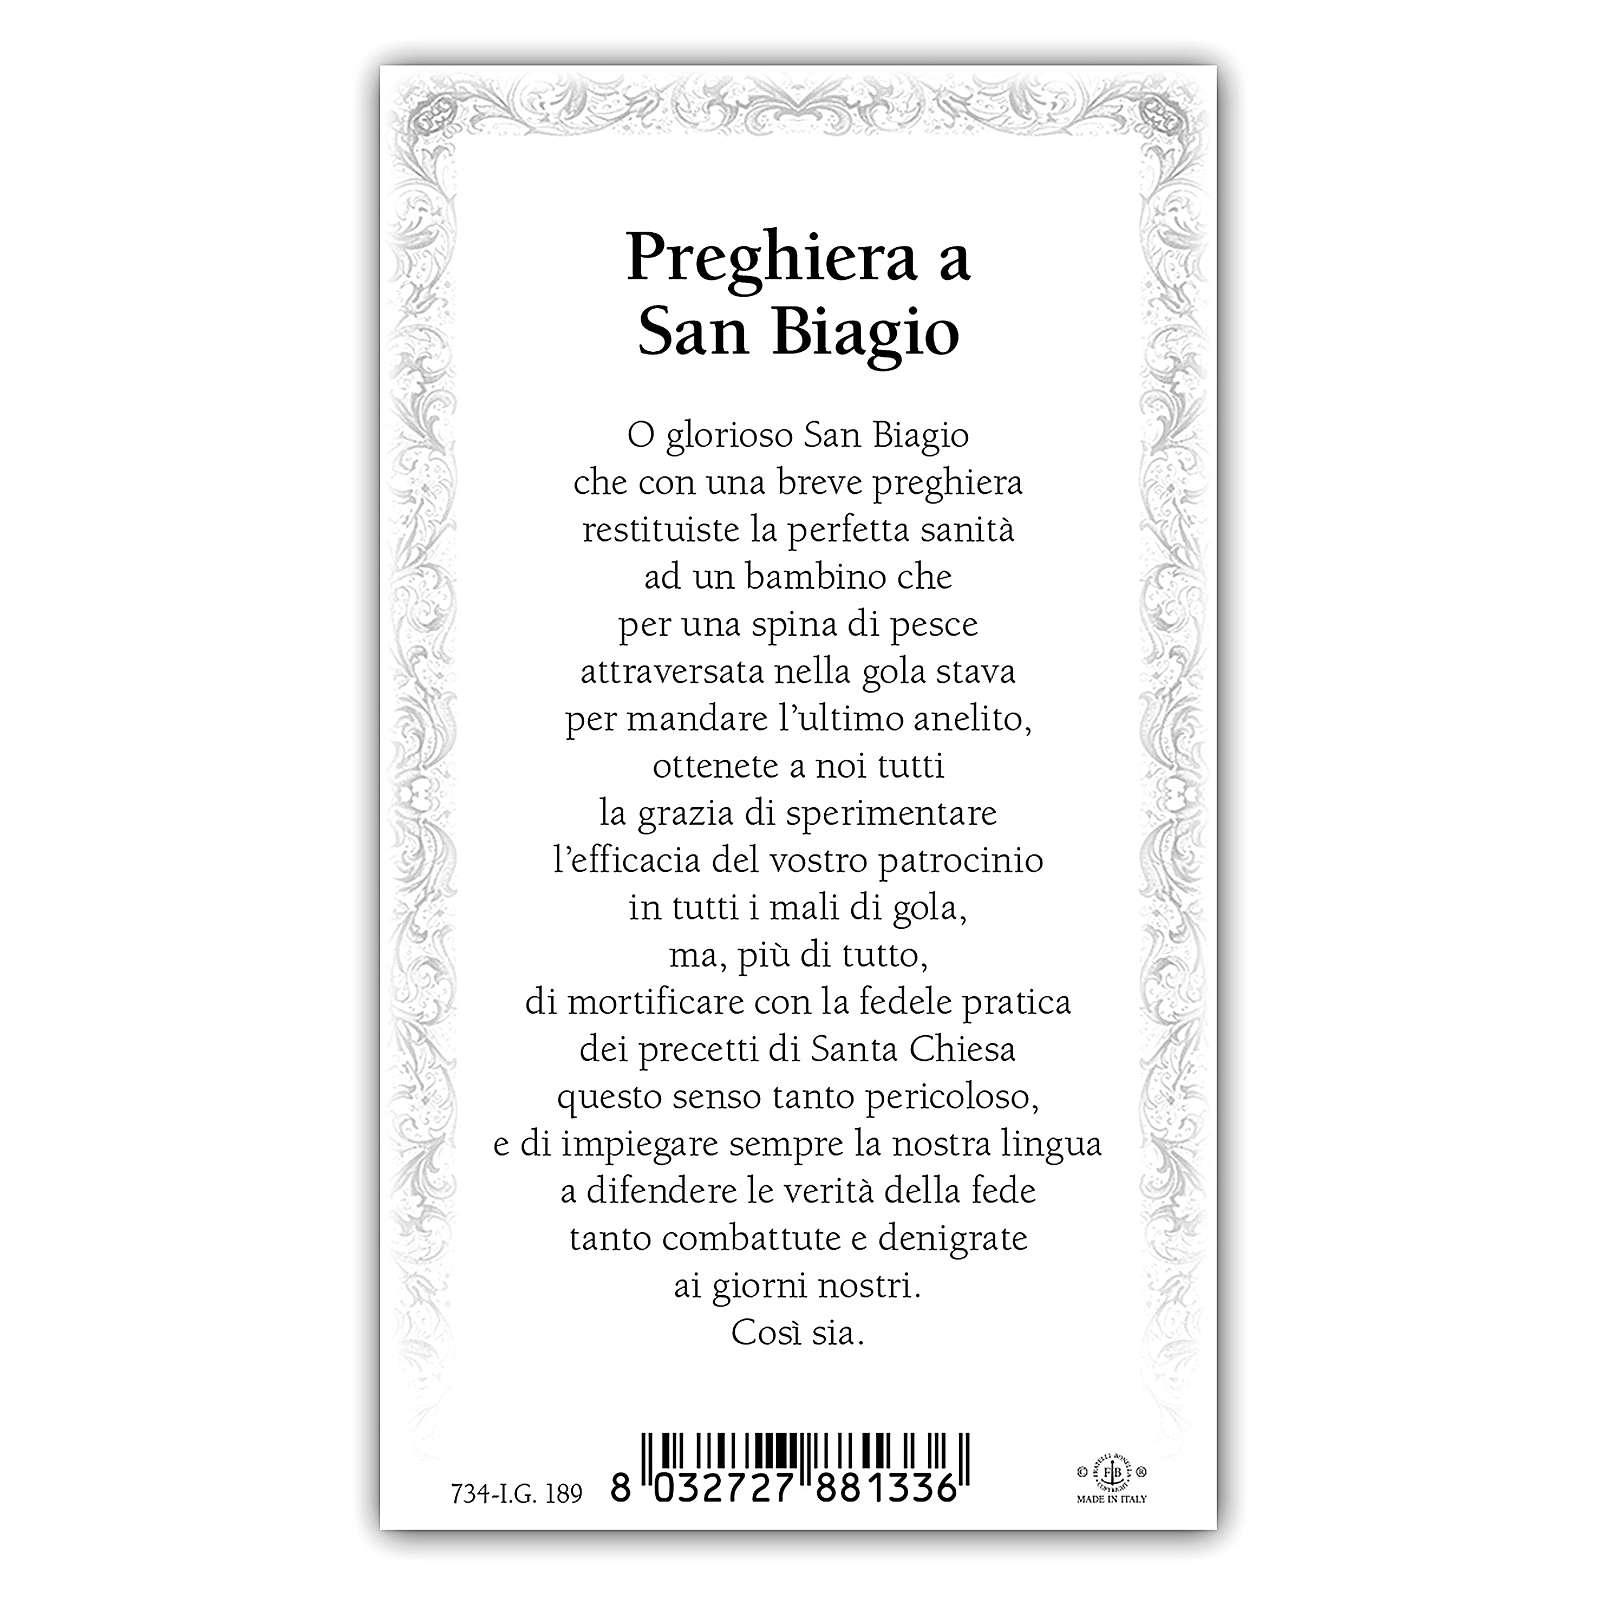 Estampa religiosa San Biagio 10x5 cm ITA 4